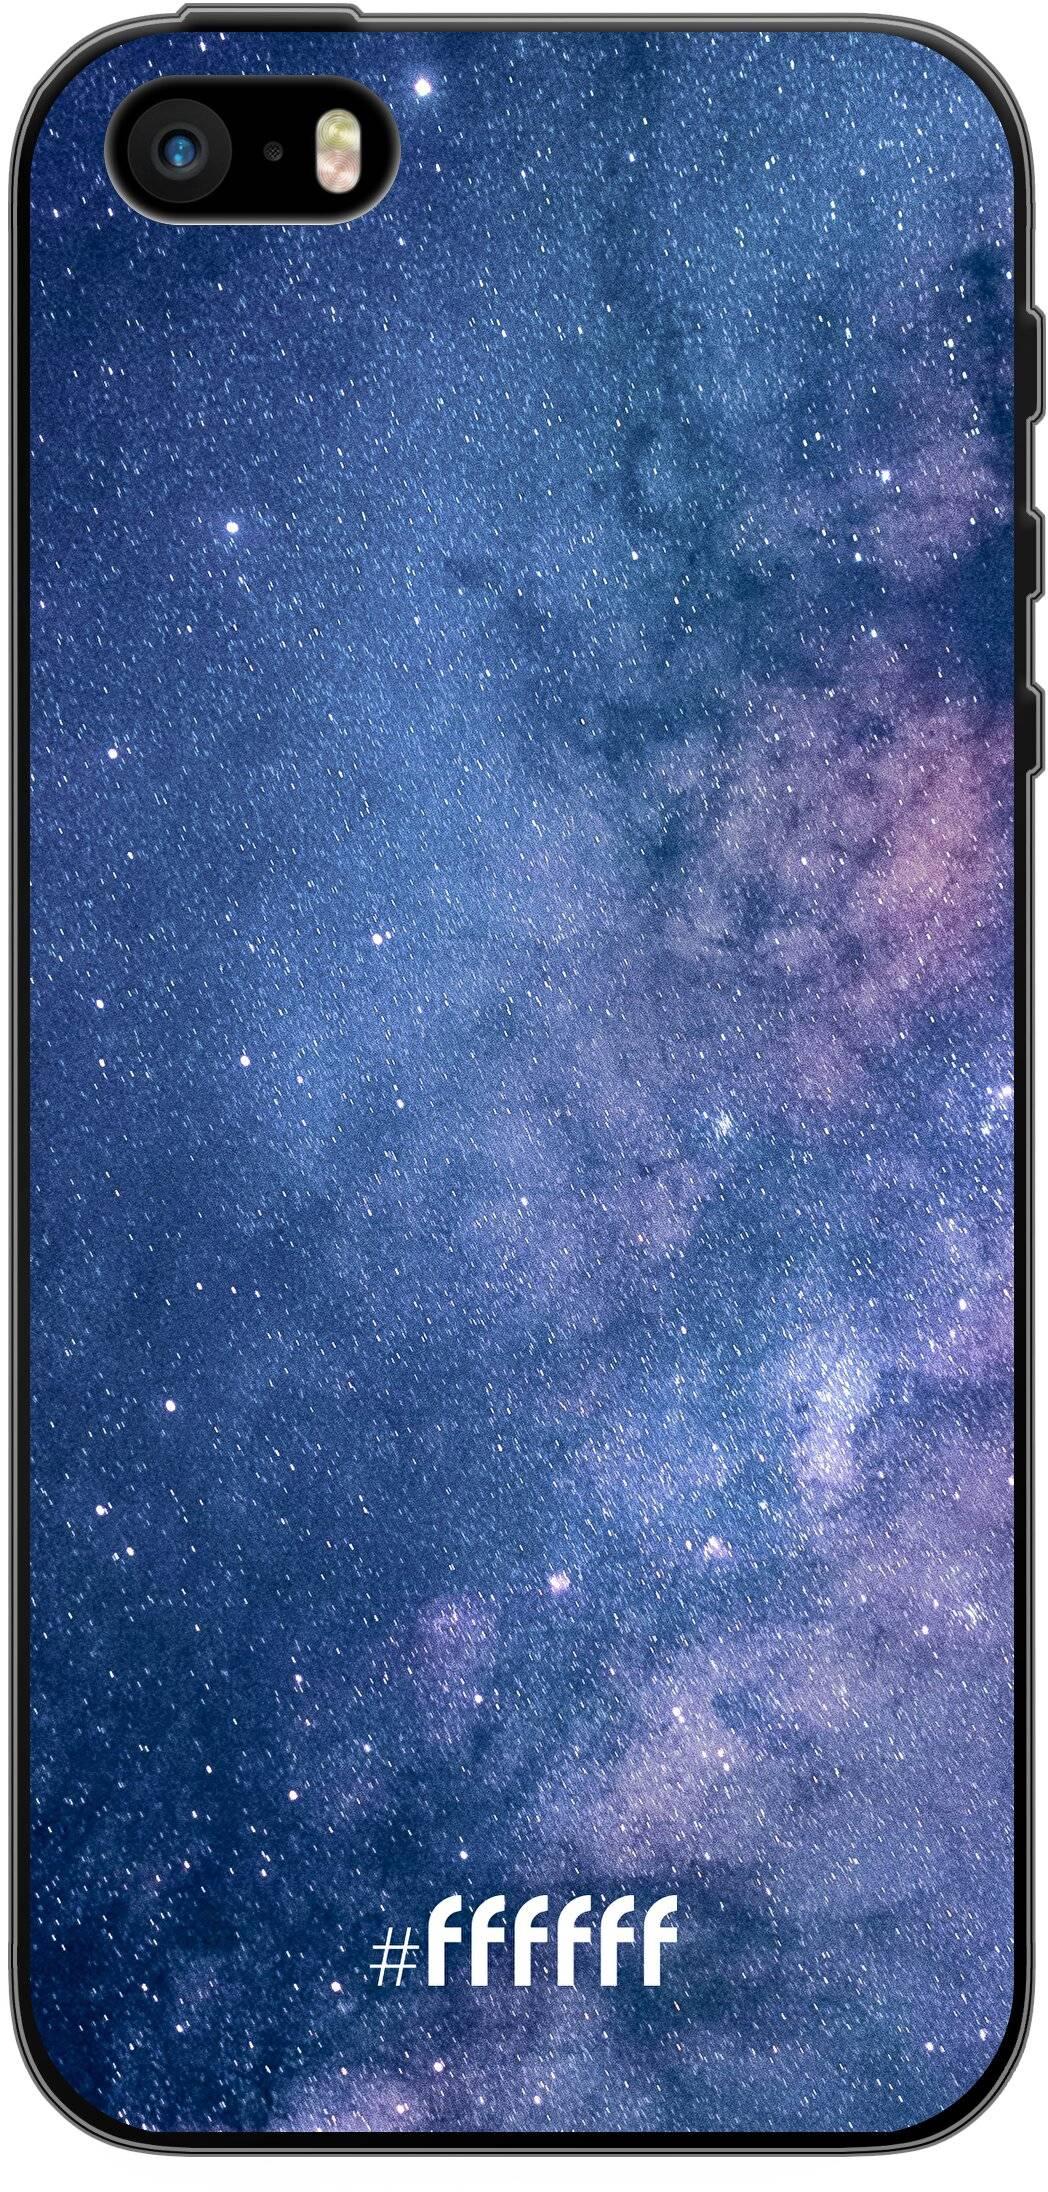 Perfect Stars iPhone 5s